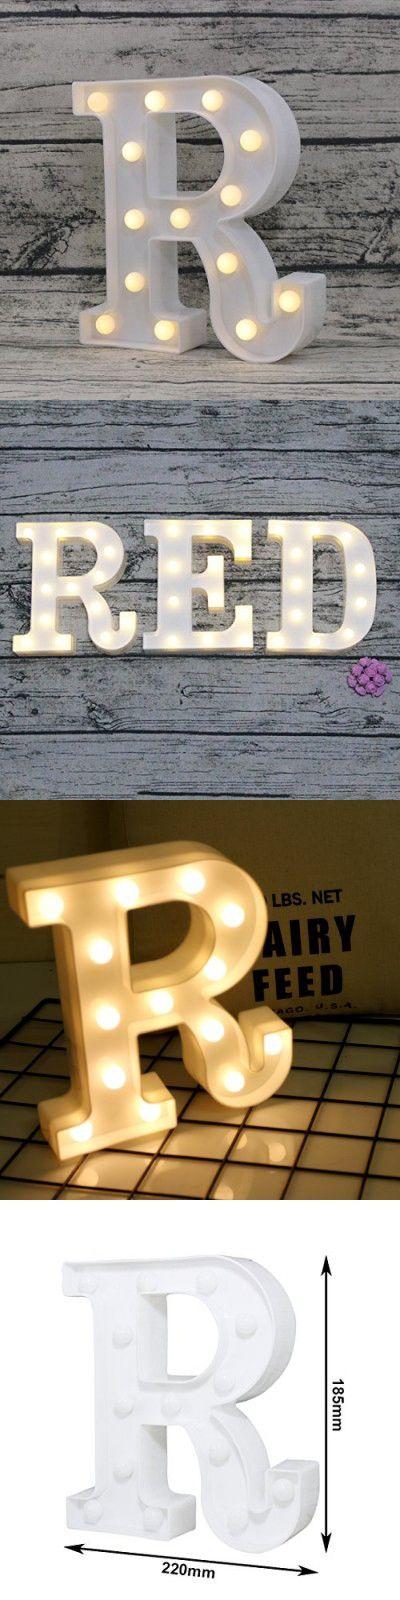 LEDIARY LED Night Light Letter Lights for Party,Home,Wedding Lighting Decor Warm White Alphabet Marquee Decoration Lights Letter R